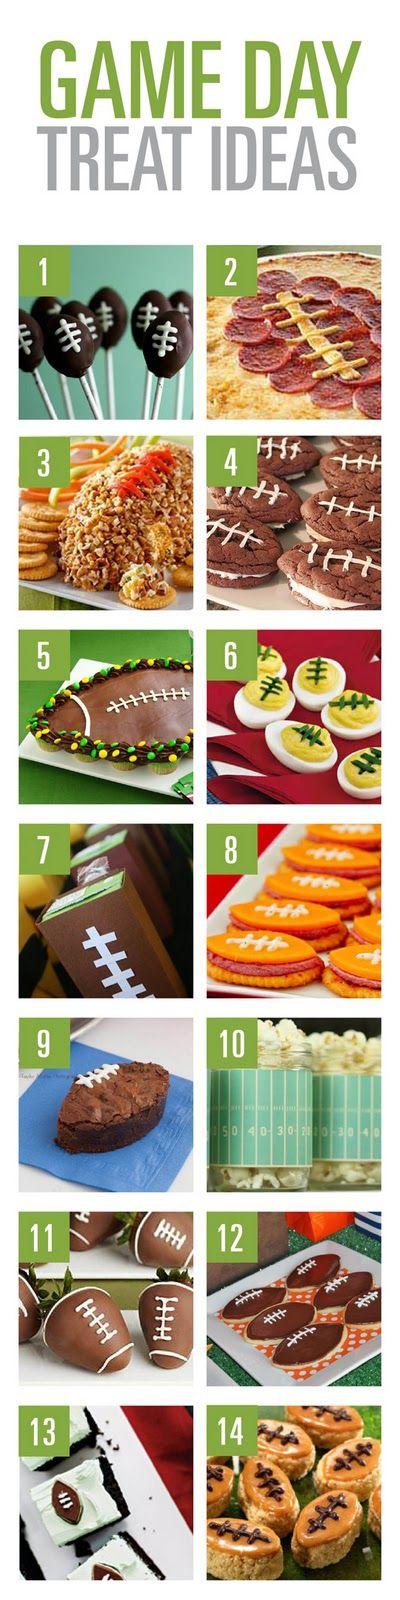 Football Treat Ideas!